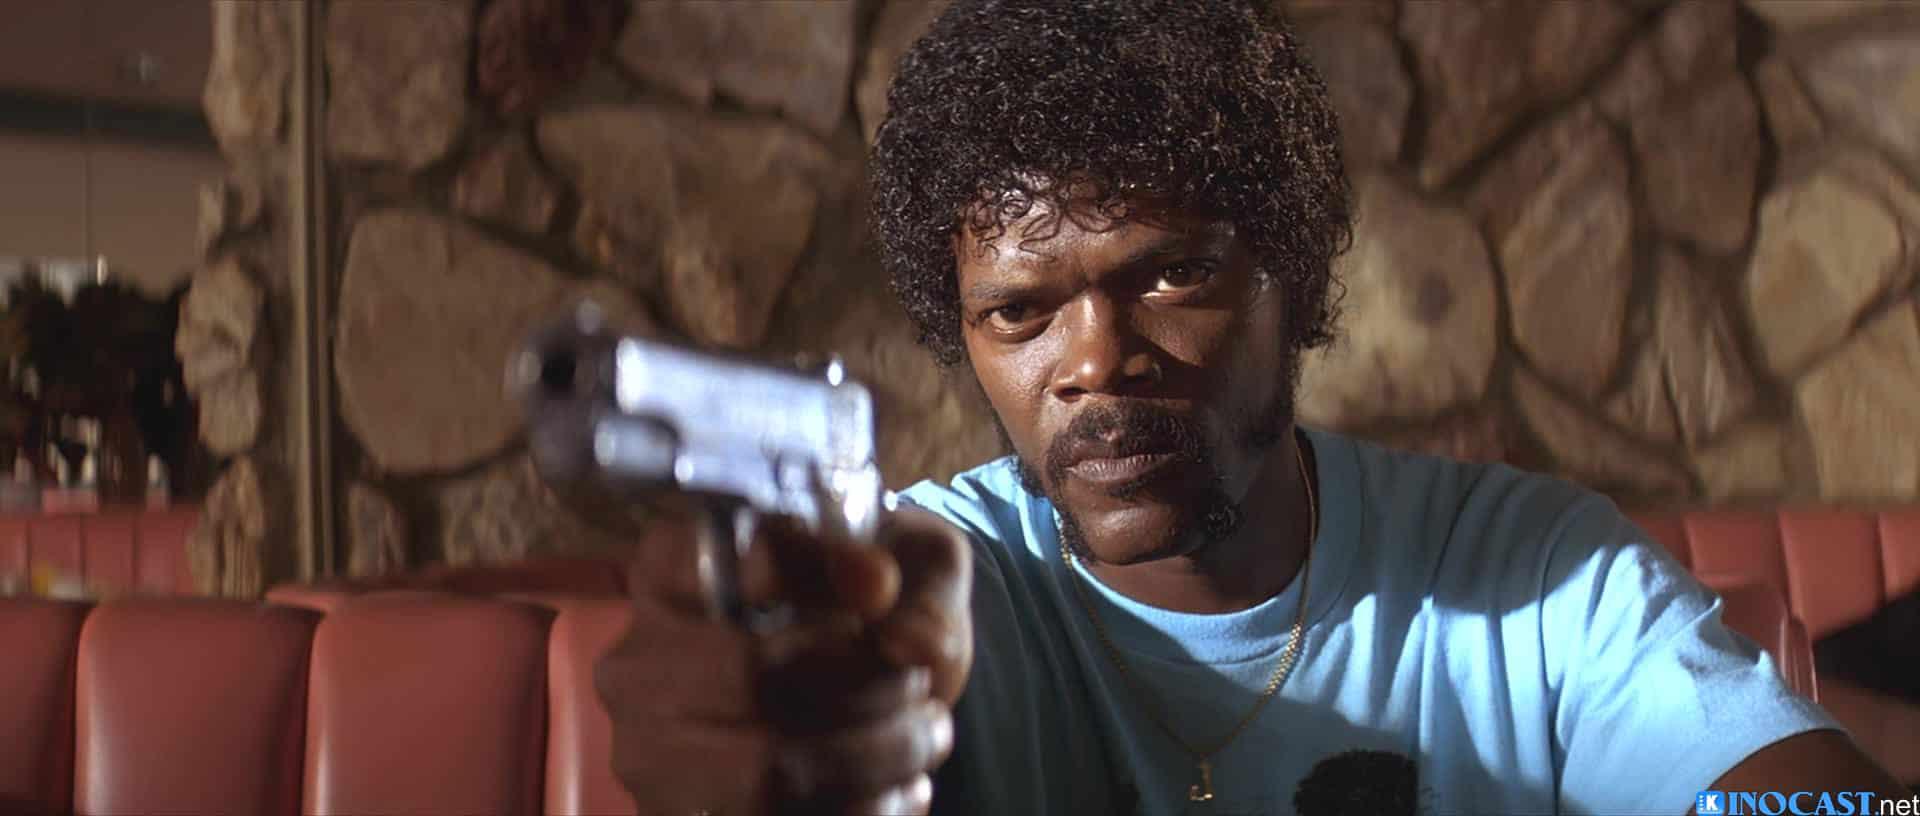 https://i2.wp.com/www.kinocast.net/wp-content/uploads/2013/06/pulp-fiction-samuel-l-jackson-wig-afro.jpg